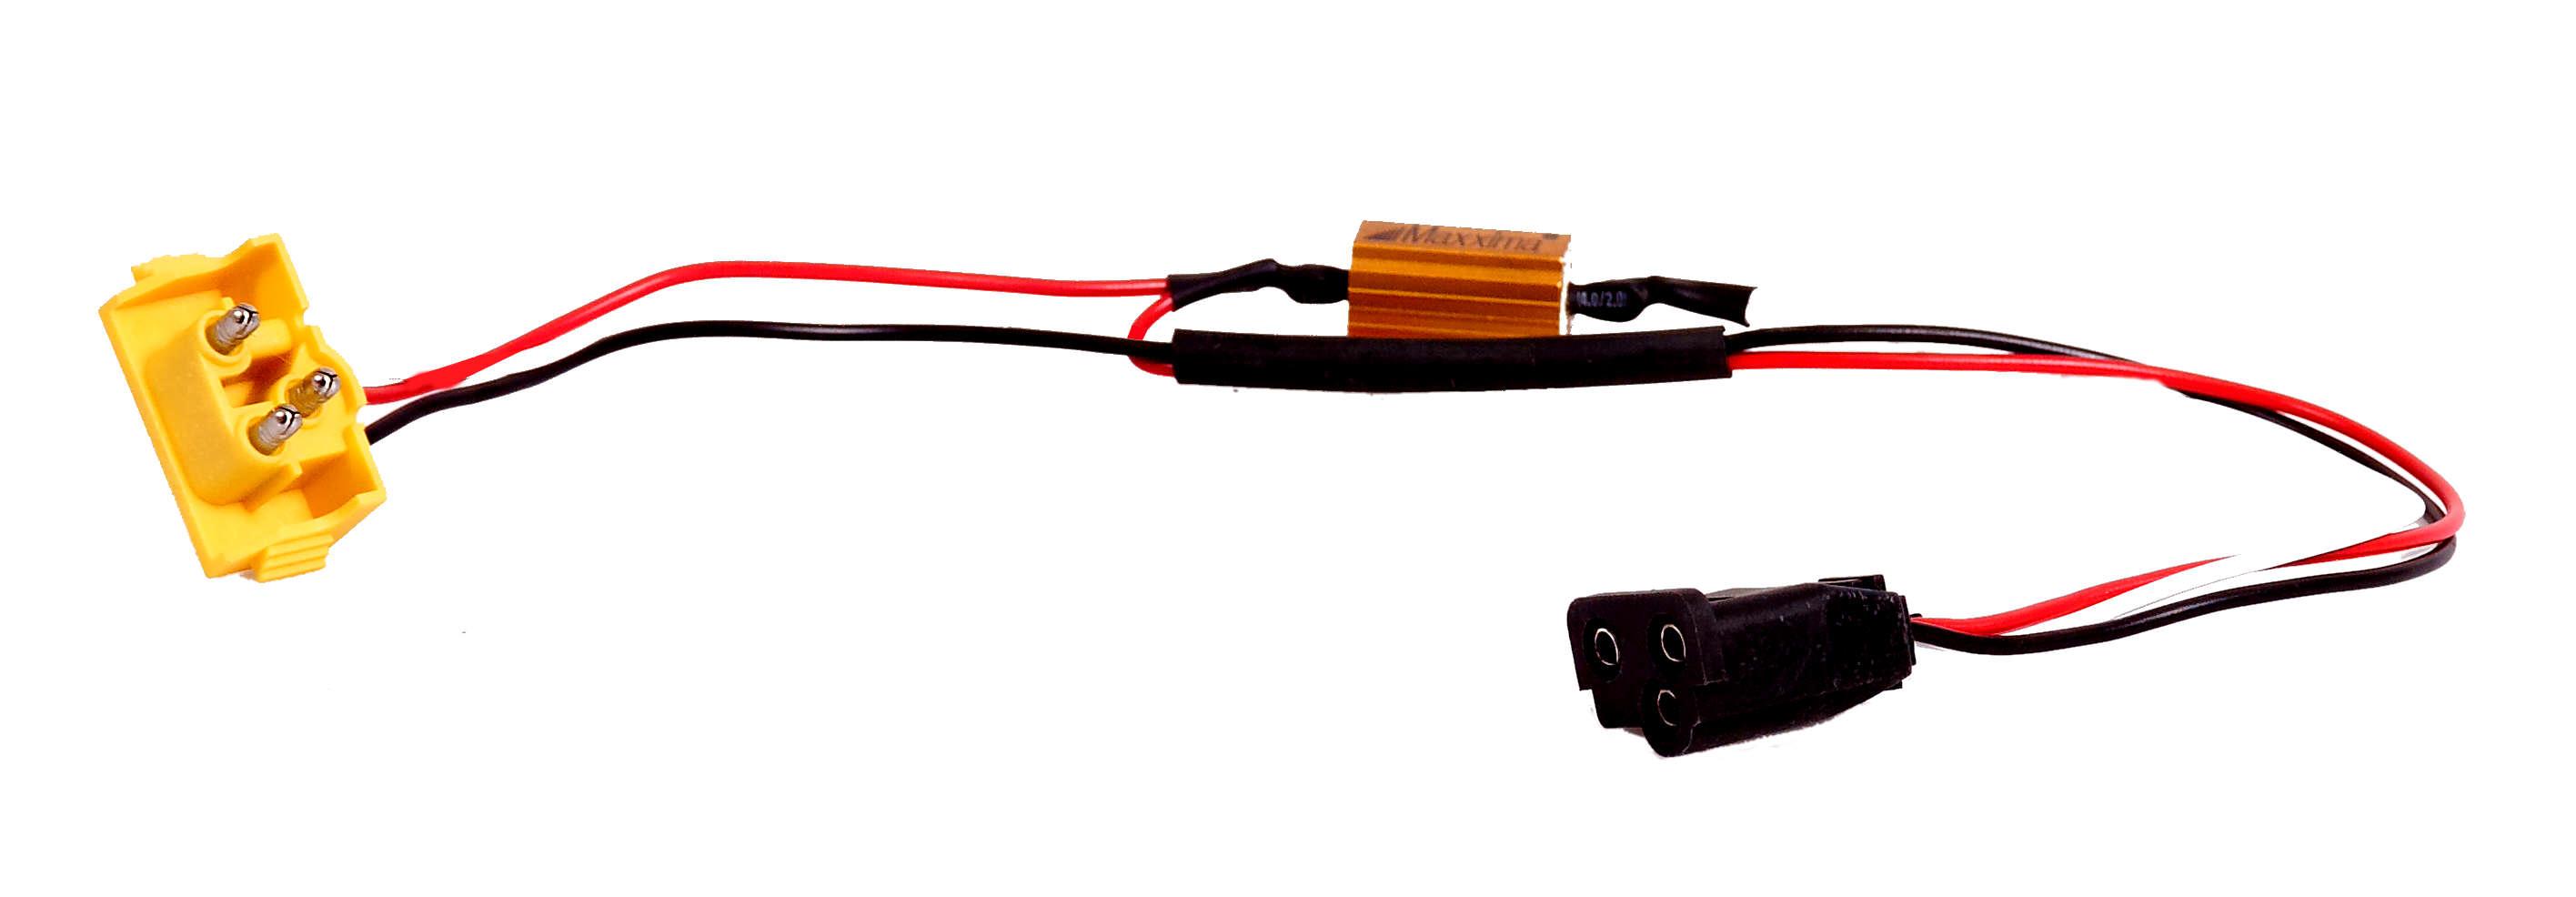 Big Rig Wiring : Wiring and adaptors big rig chrome shop semi truck